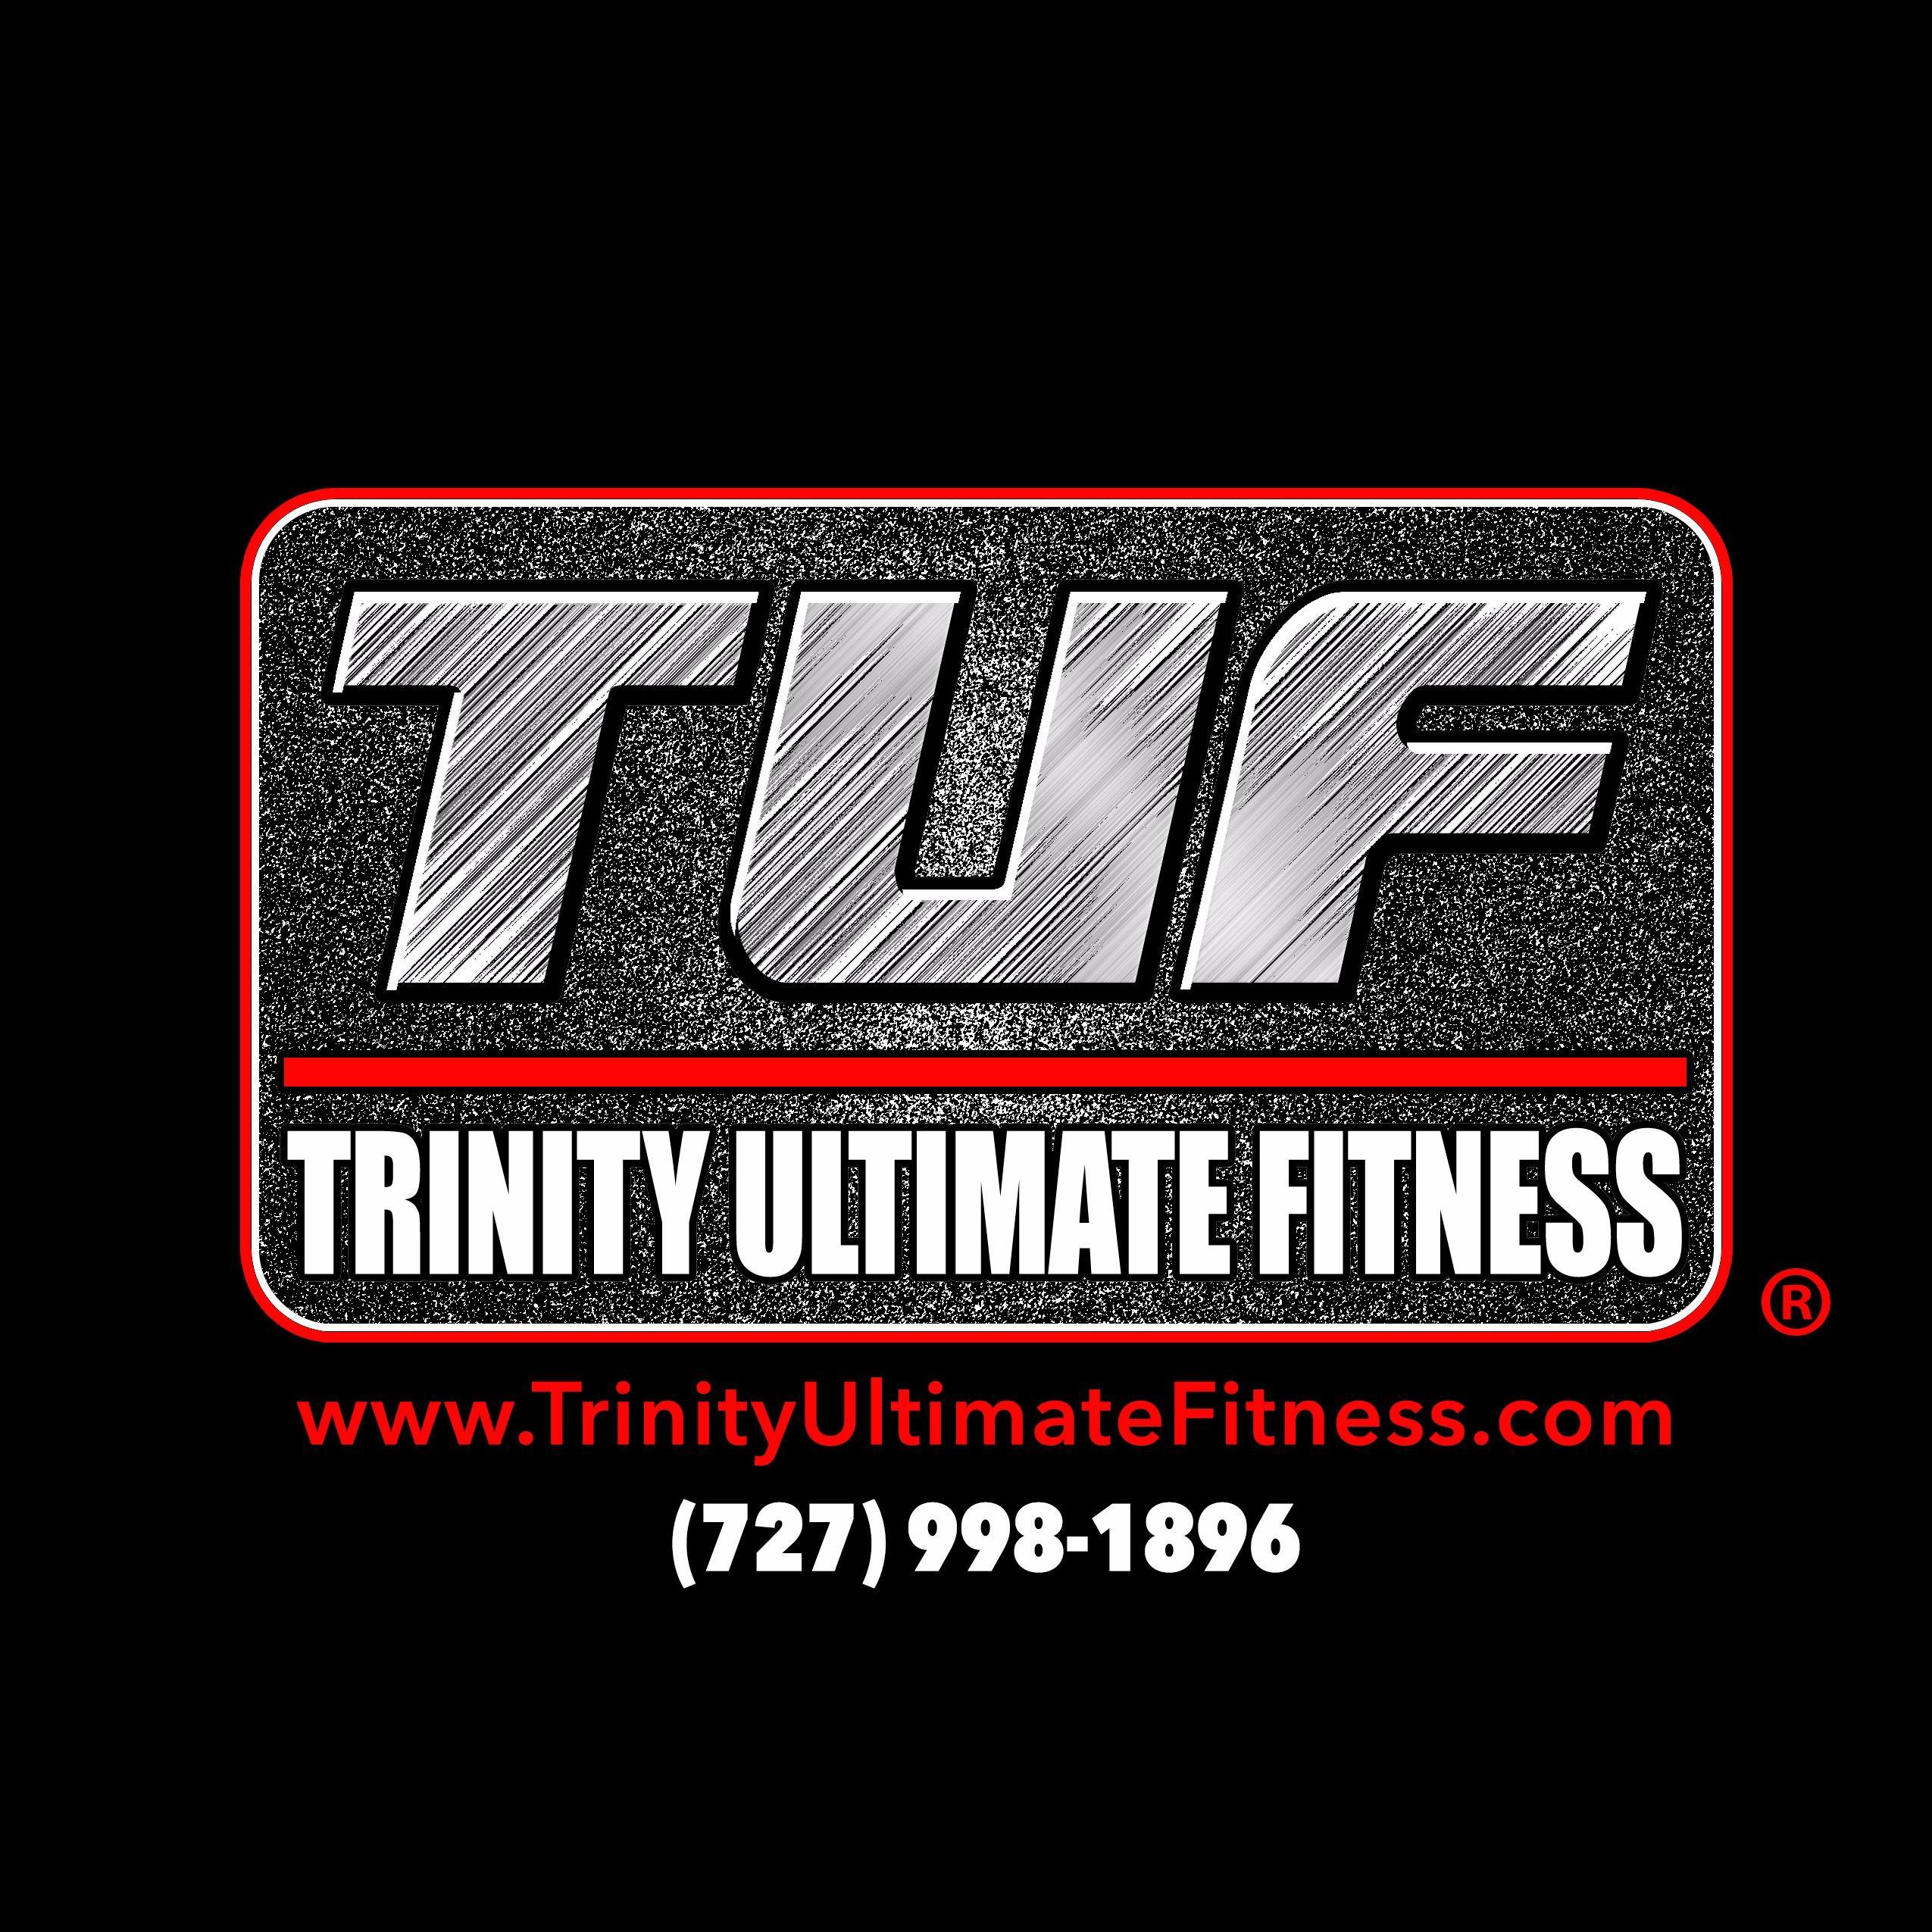 Trinity Ultimate Fitness